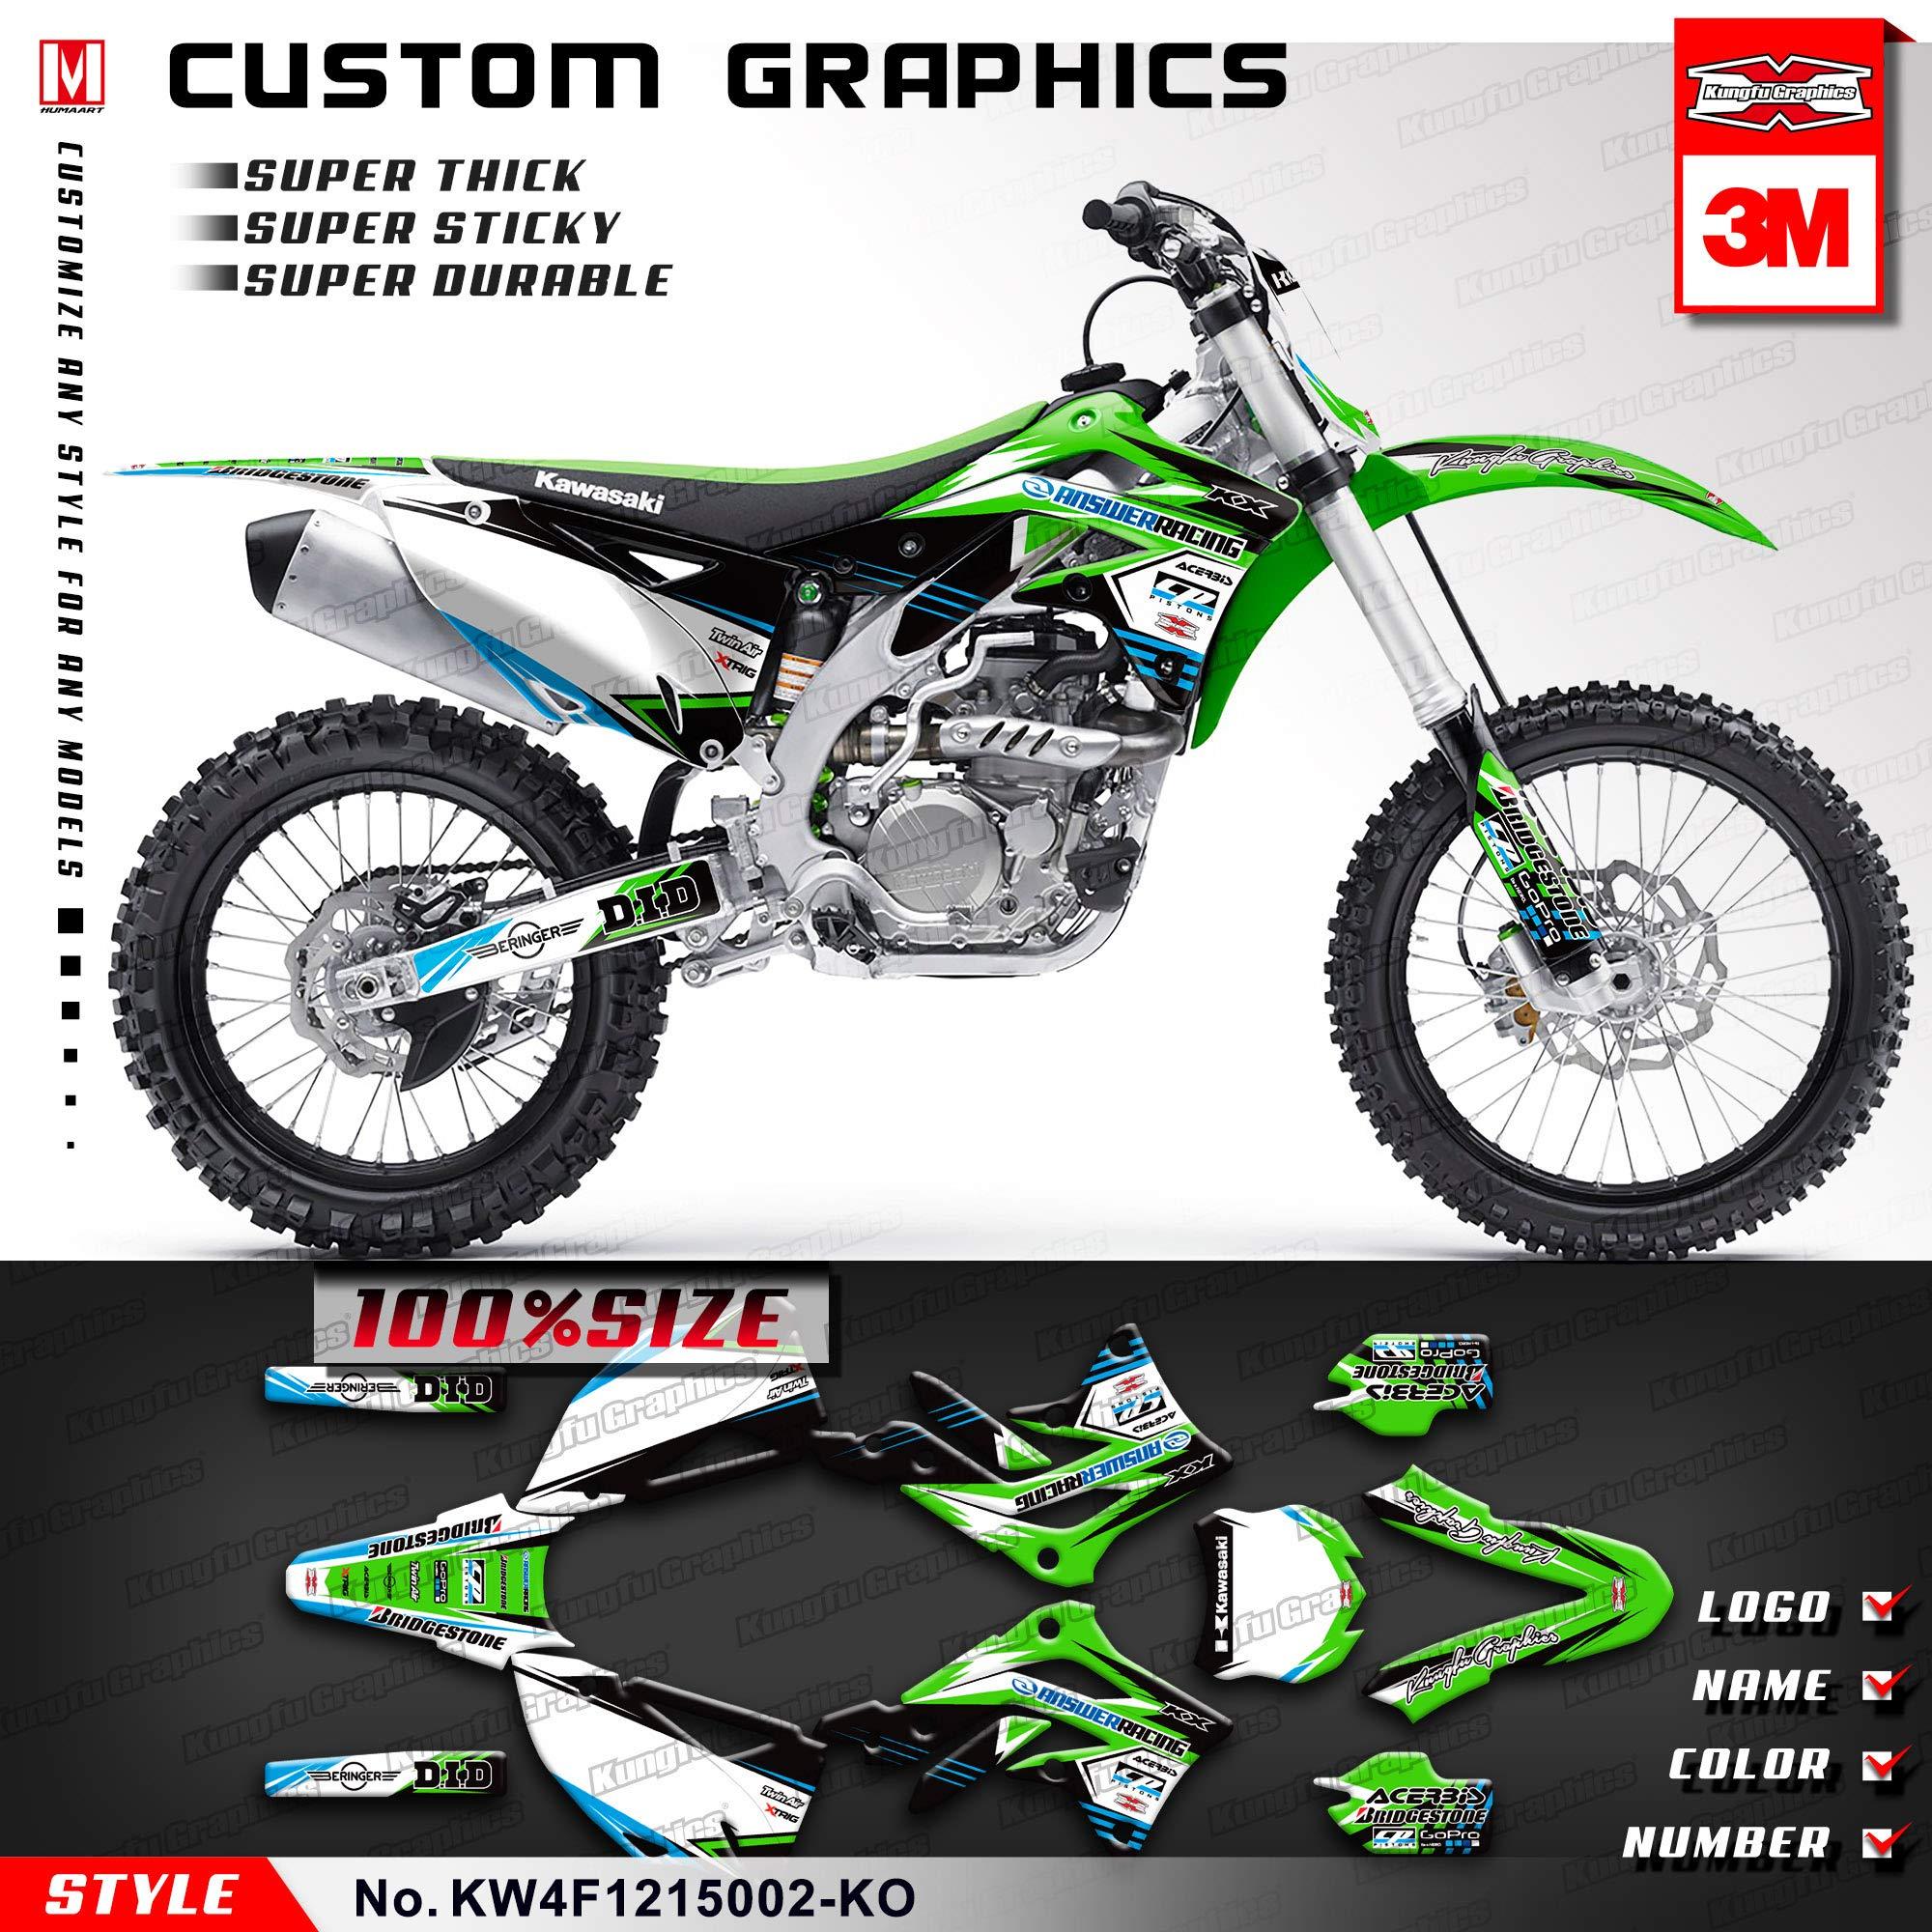 Kungfu Graphics Custom Decal Kit for Kawasaki KX450F 2012, White Black Green,KW4F1215002-KO